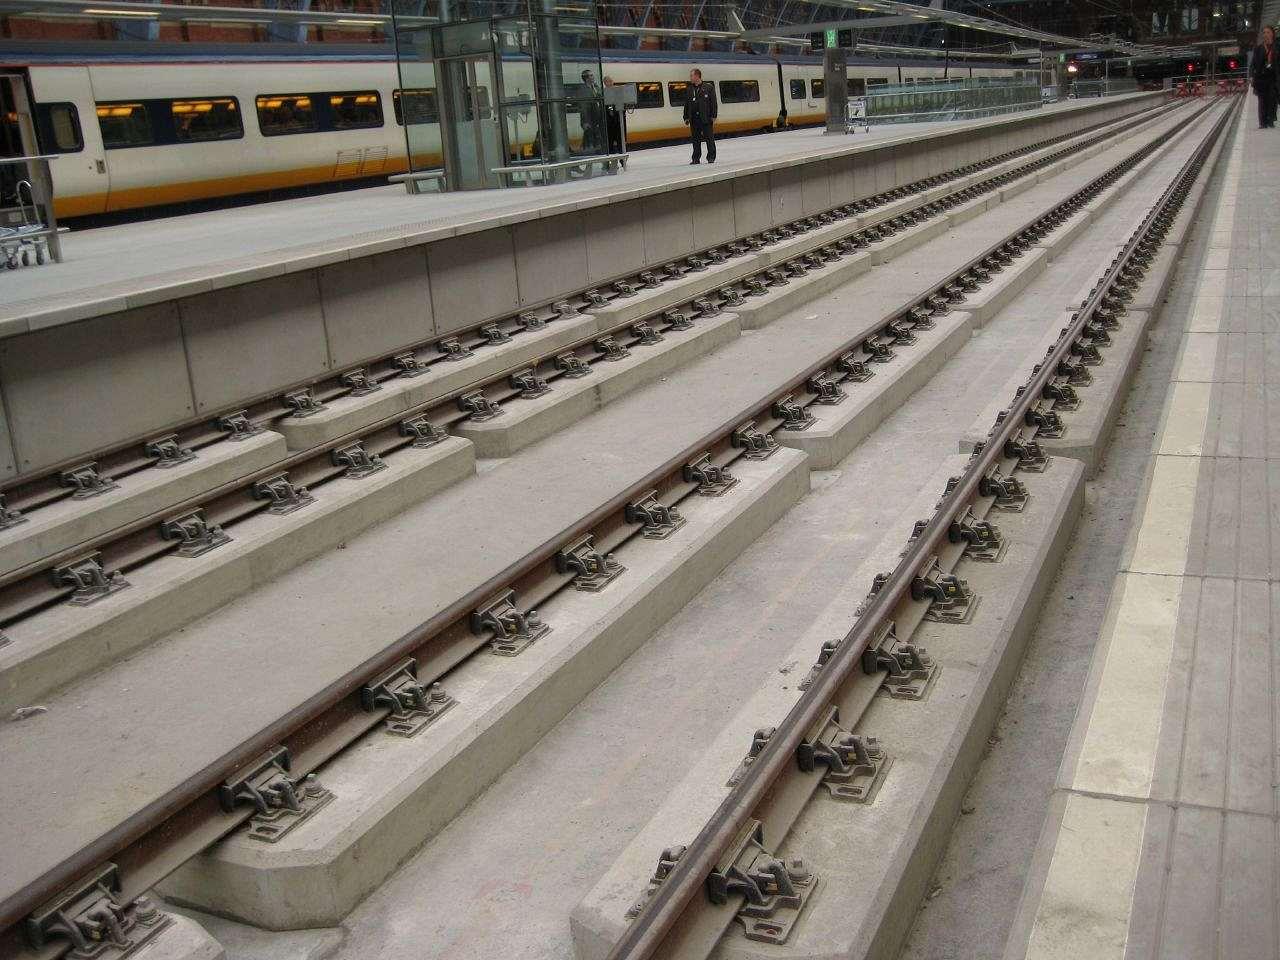 Tracks of St Pancras